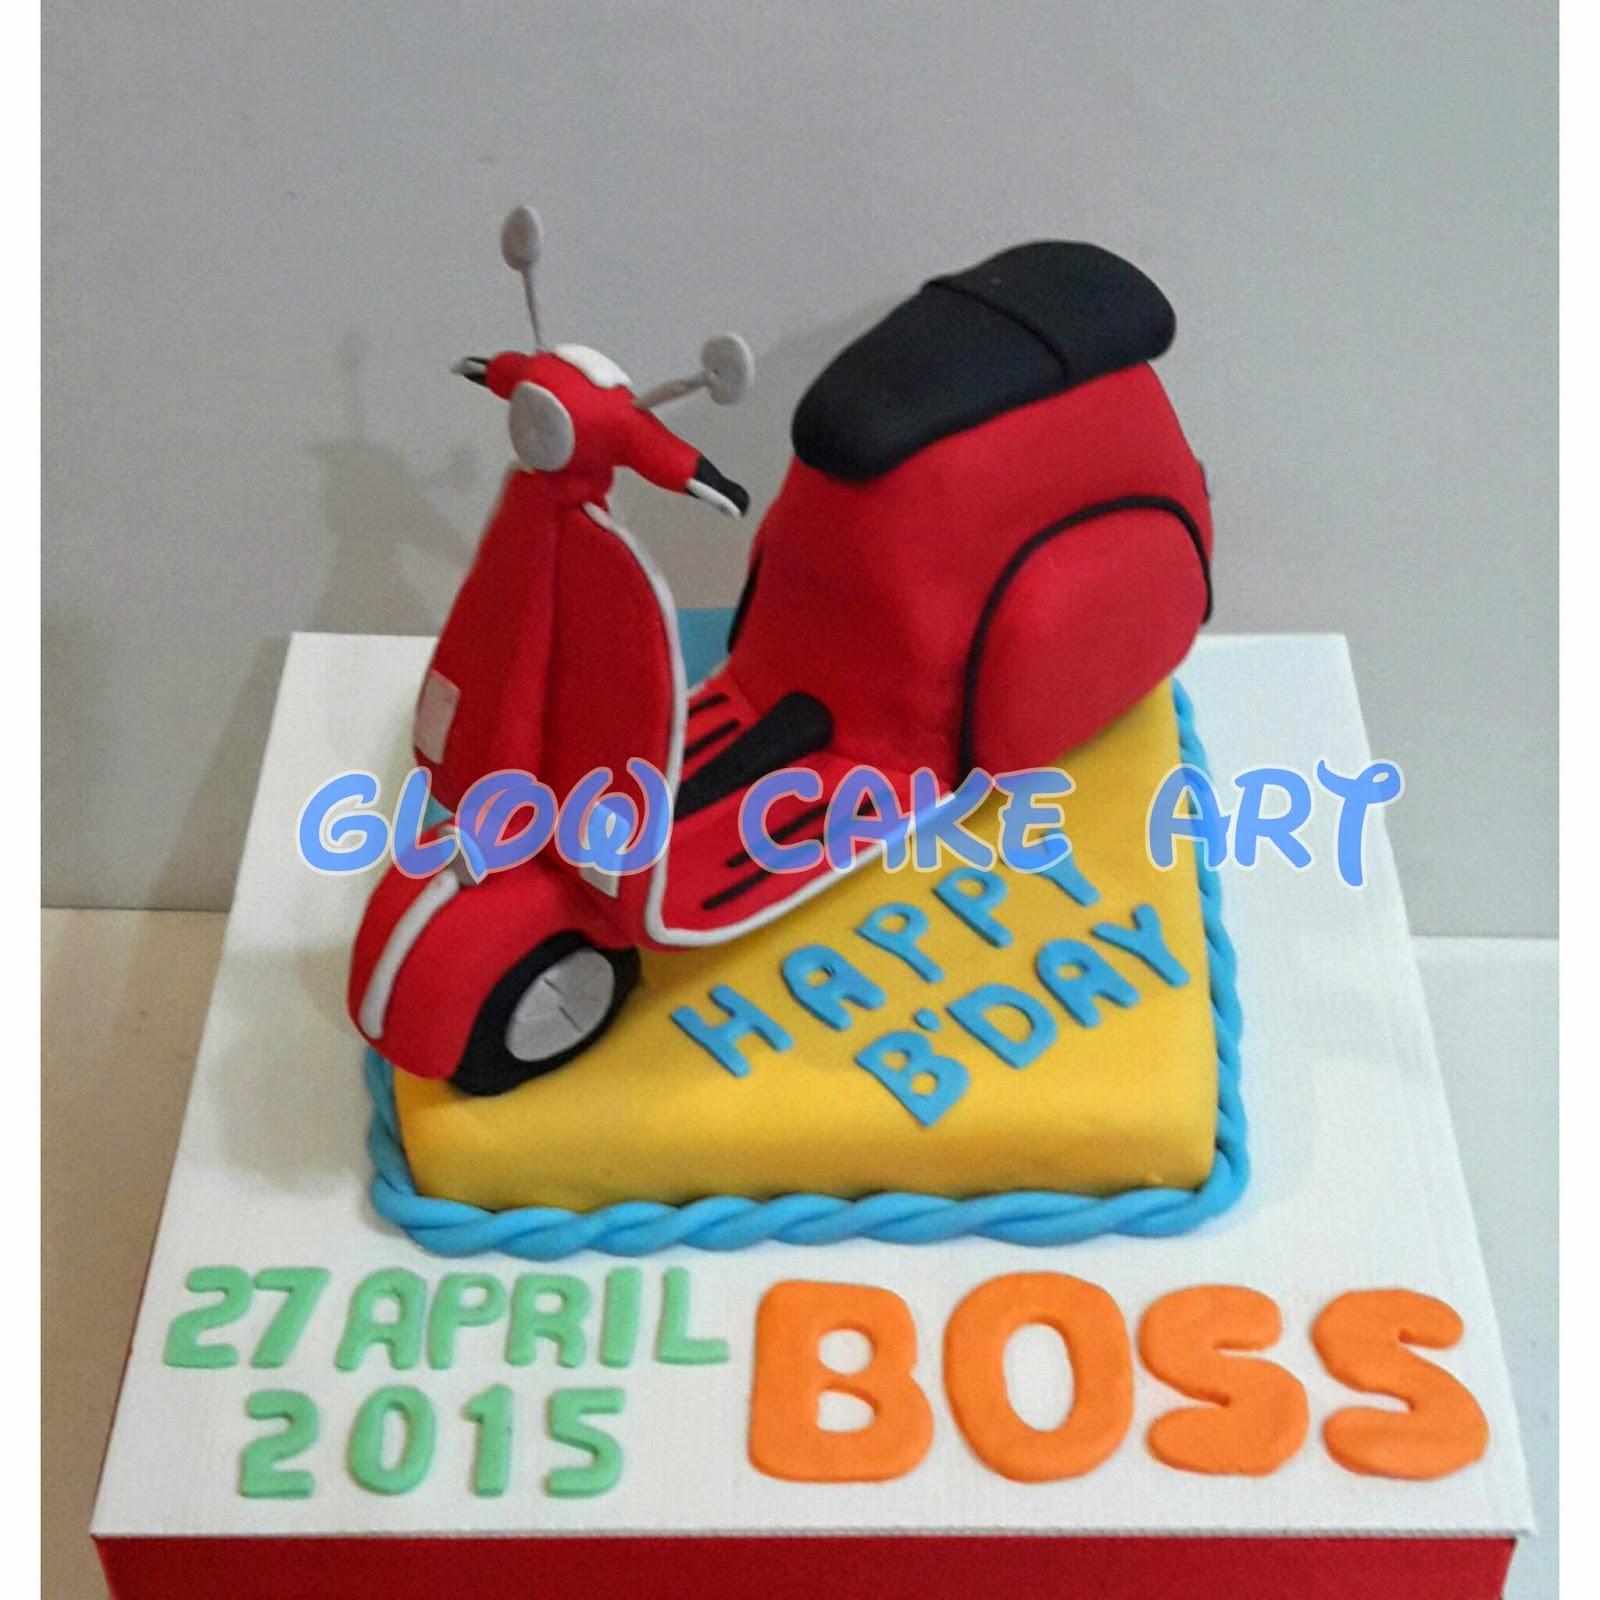 Mommy Cake and Cookies GLOW CAKE ART Vespa Cake